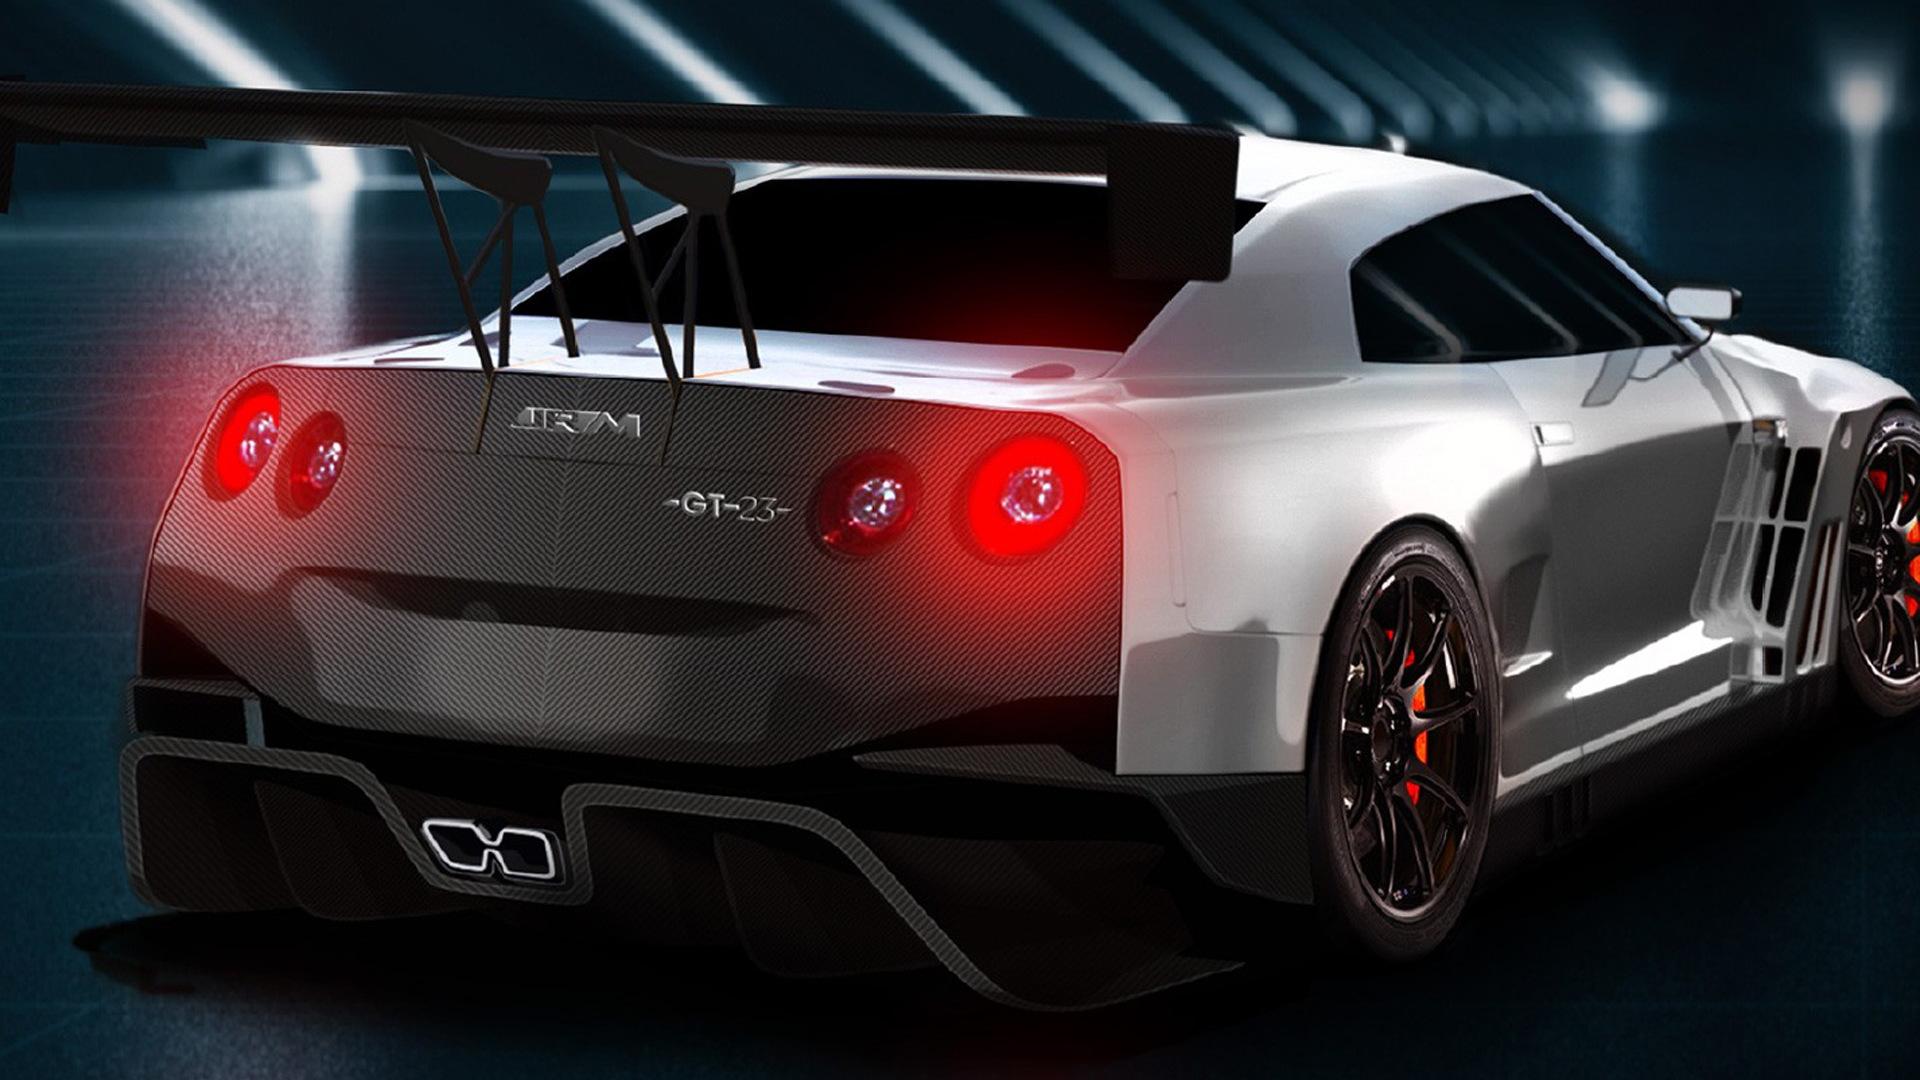 2020 JRM GT23